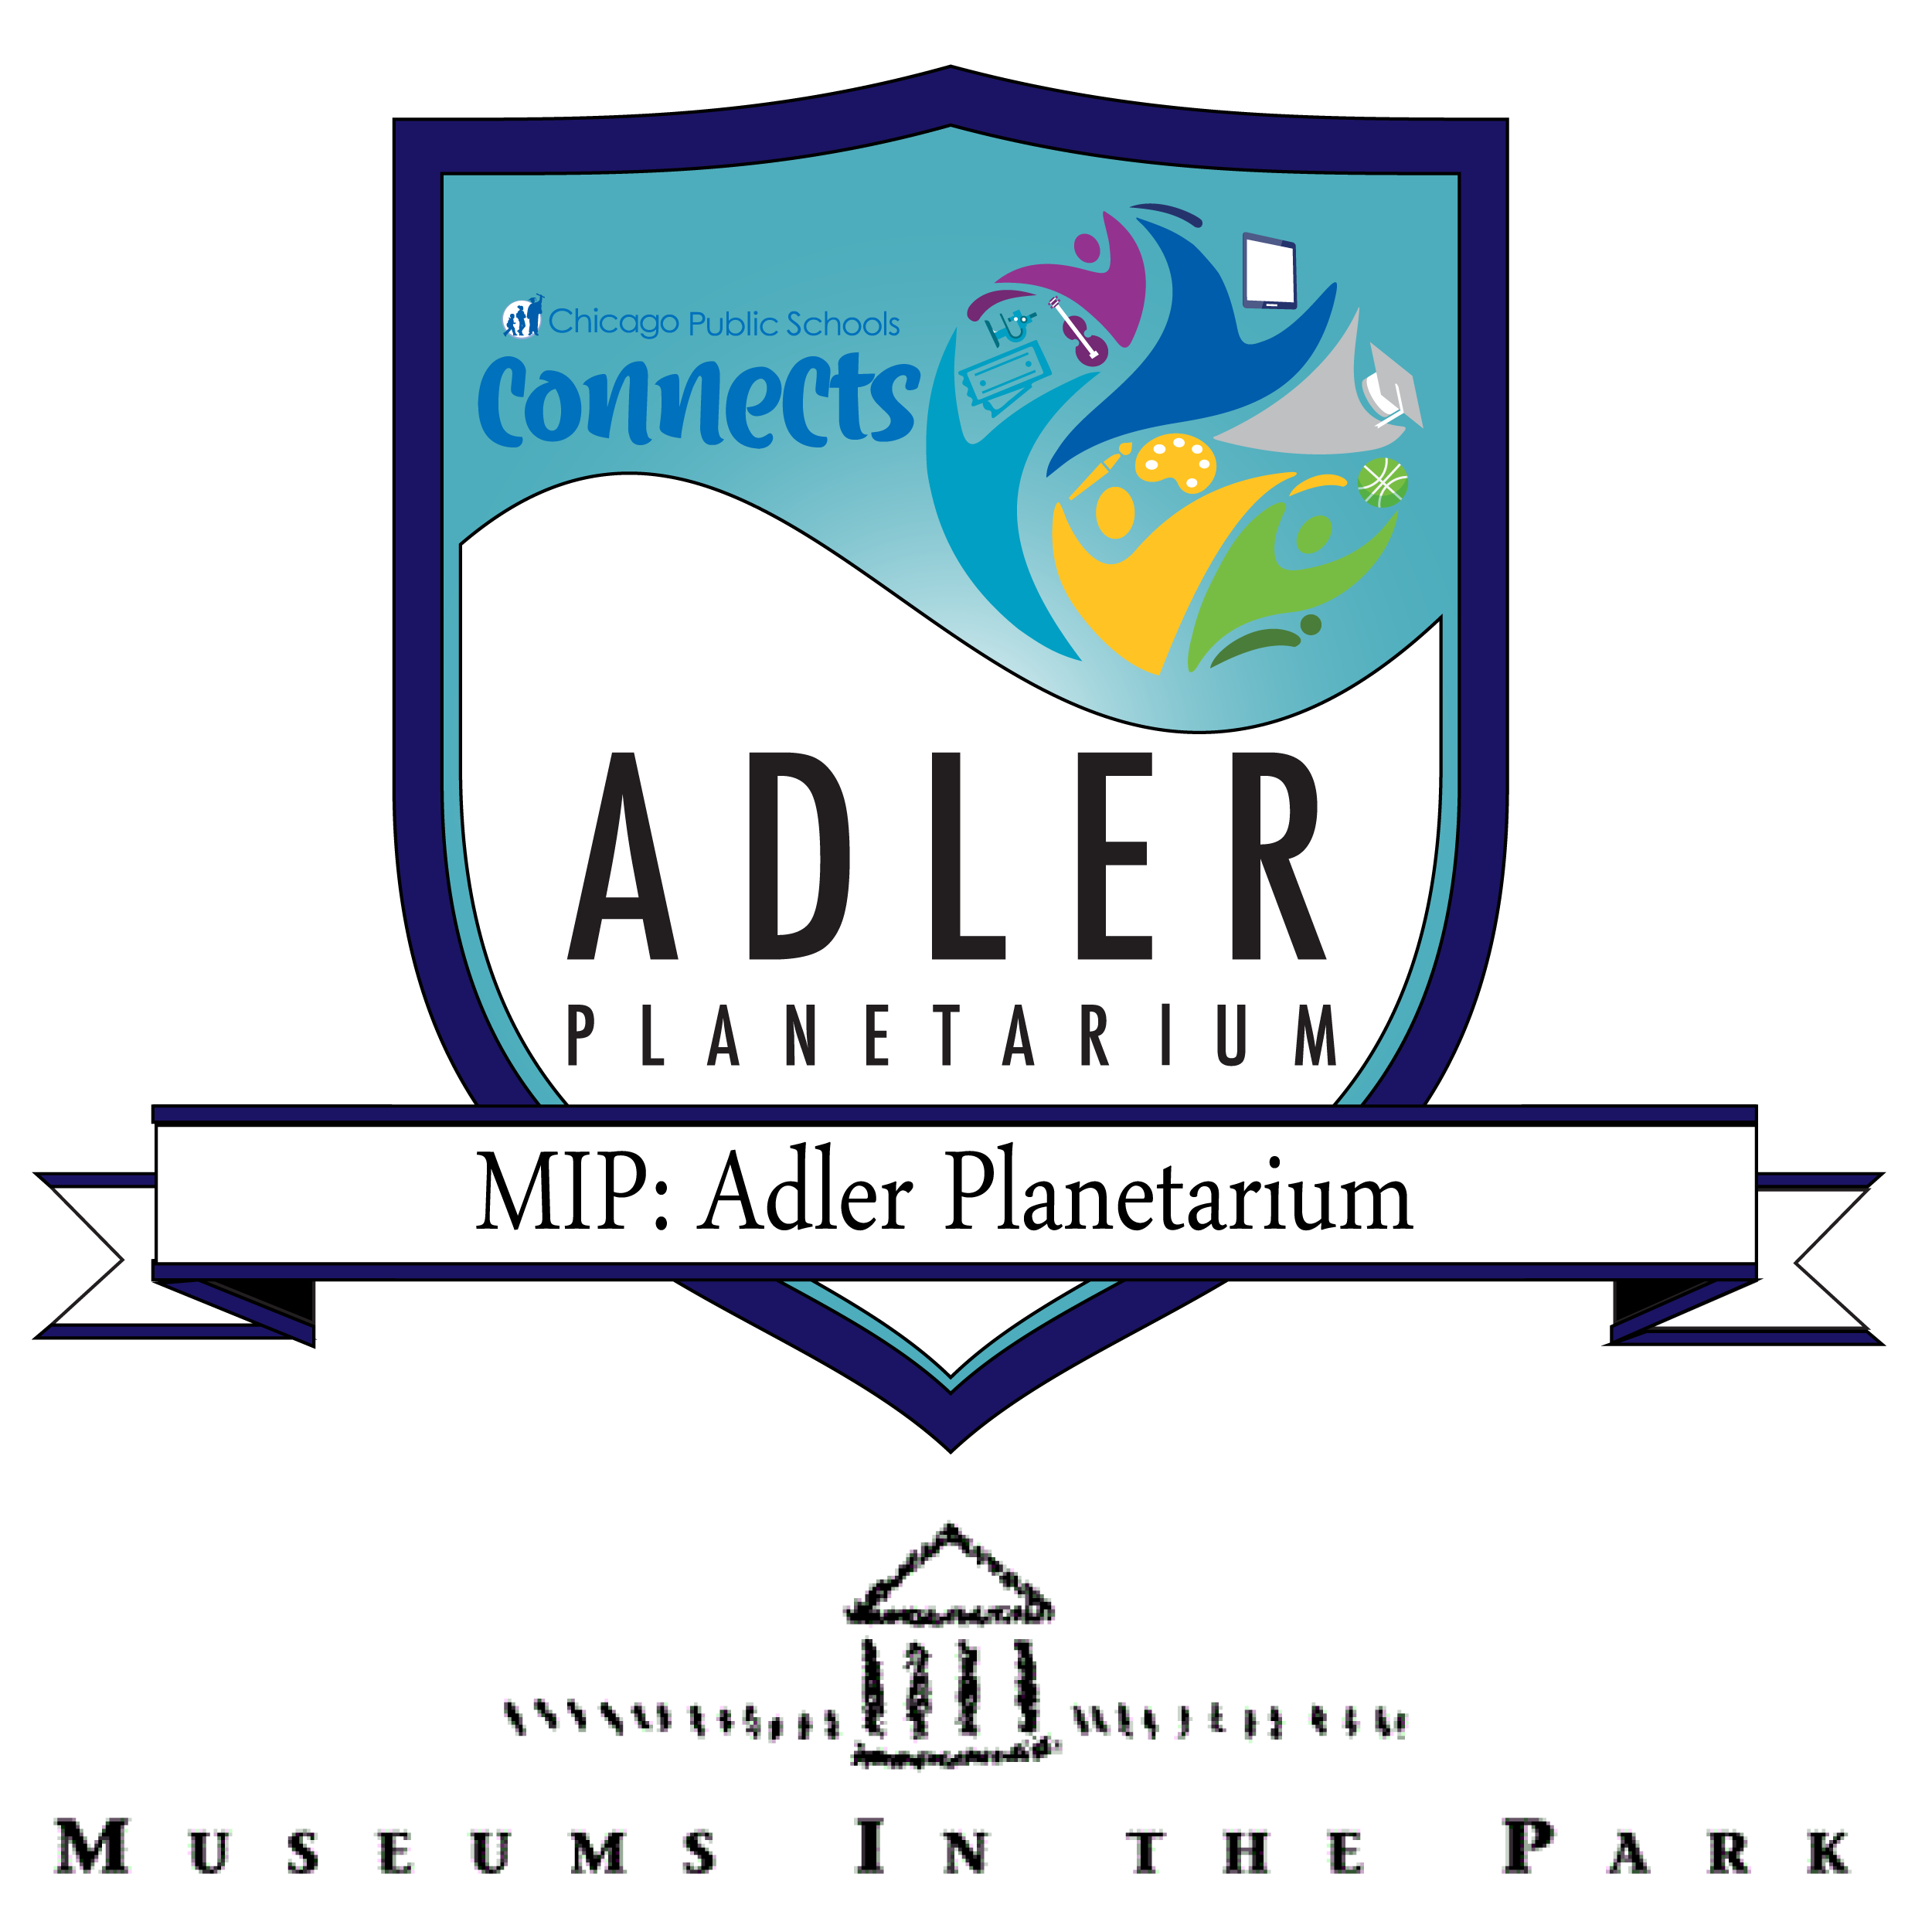 Museums in the Park: Adler Planetarium